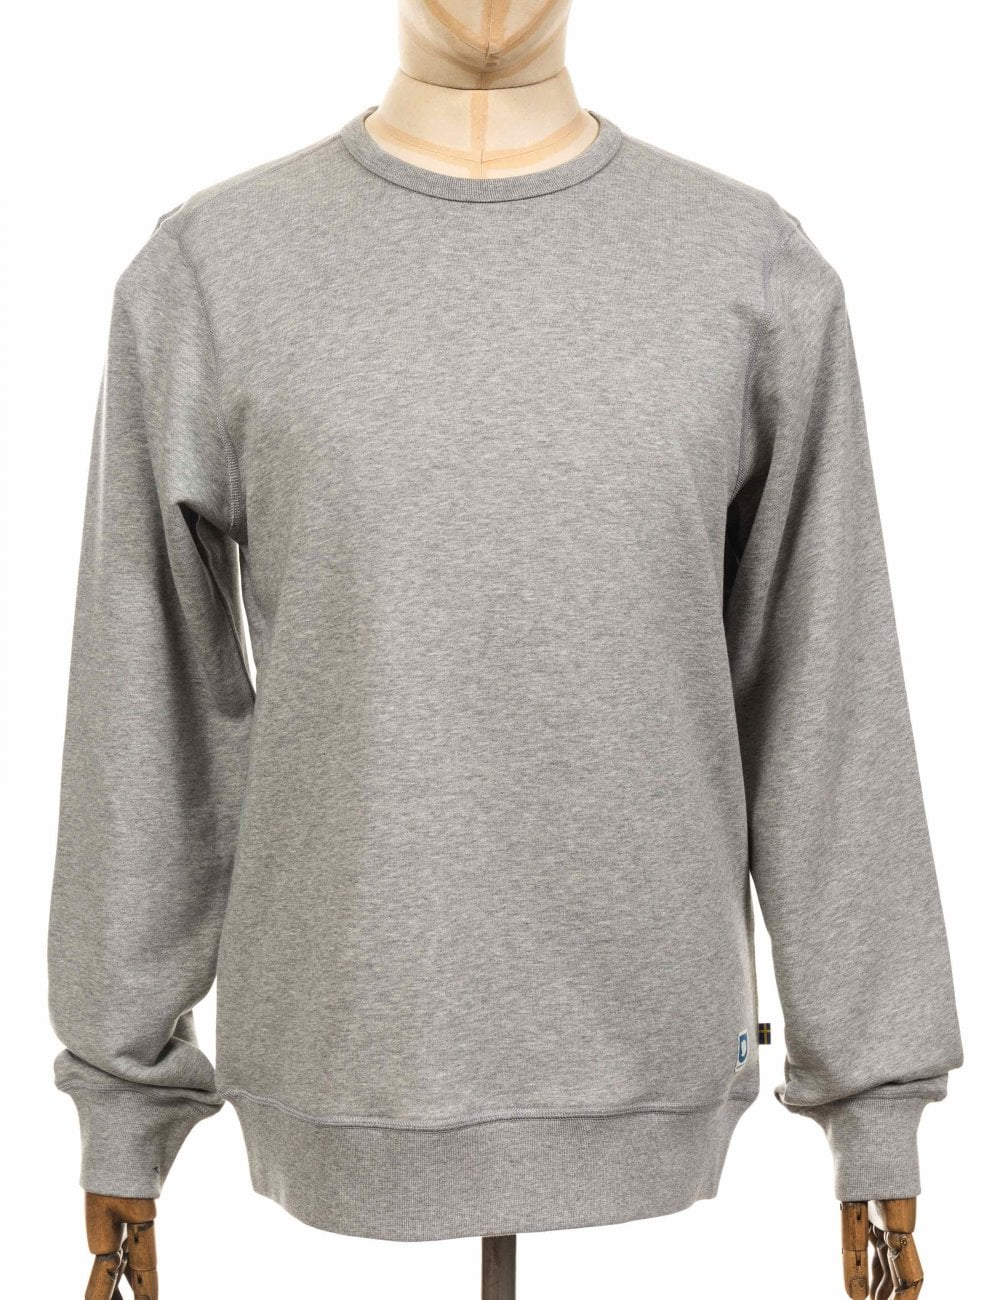 7247bcb5f Fjallraven Greenland Sweatshirt - Grey Heather - Clothing from Fat ...